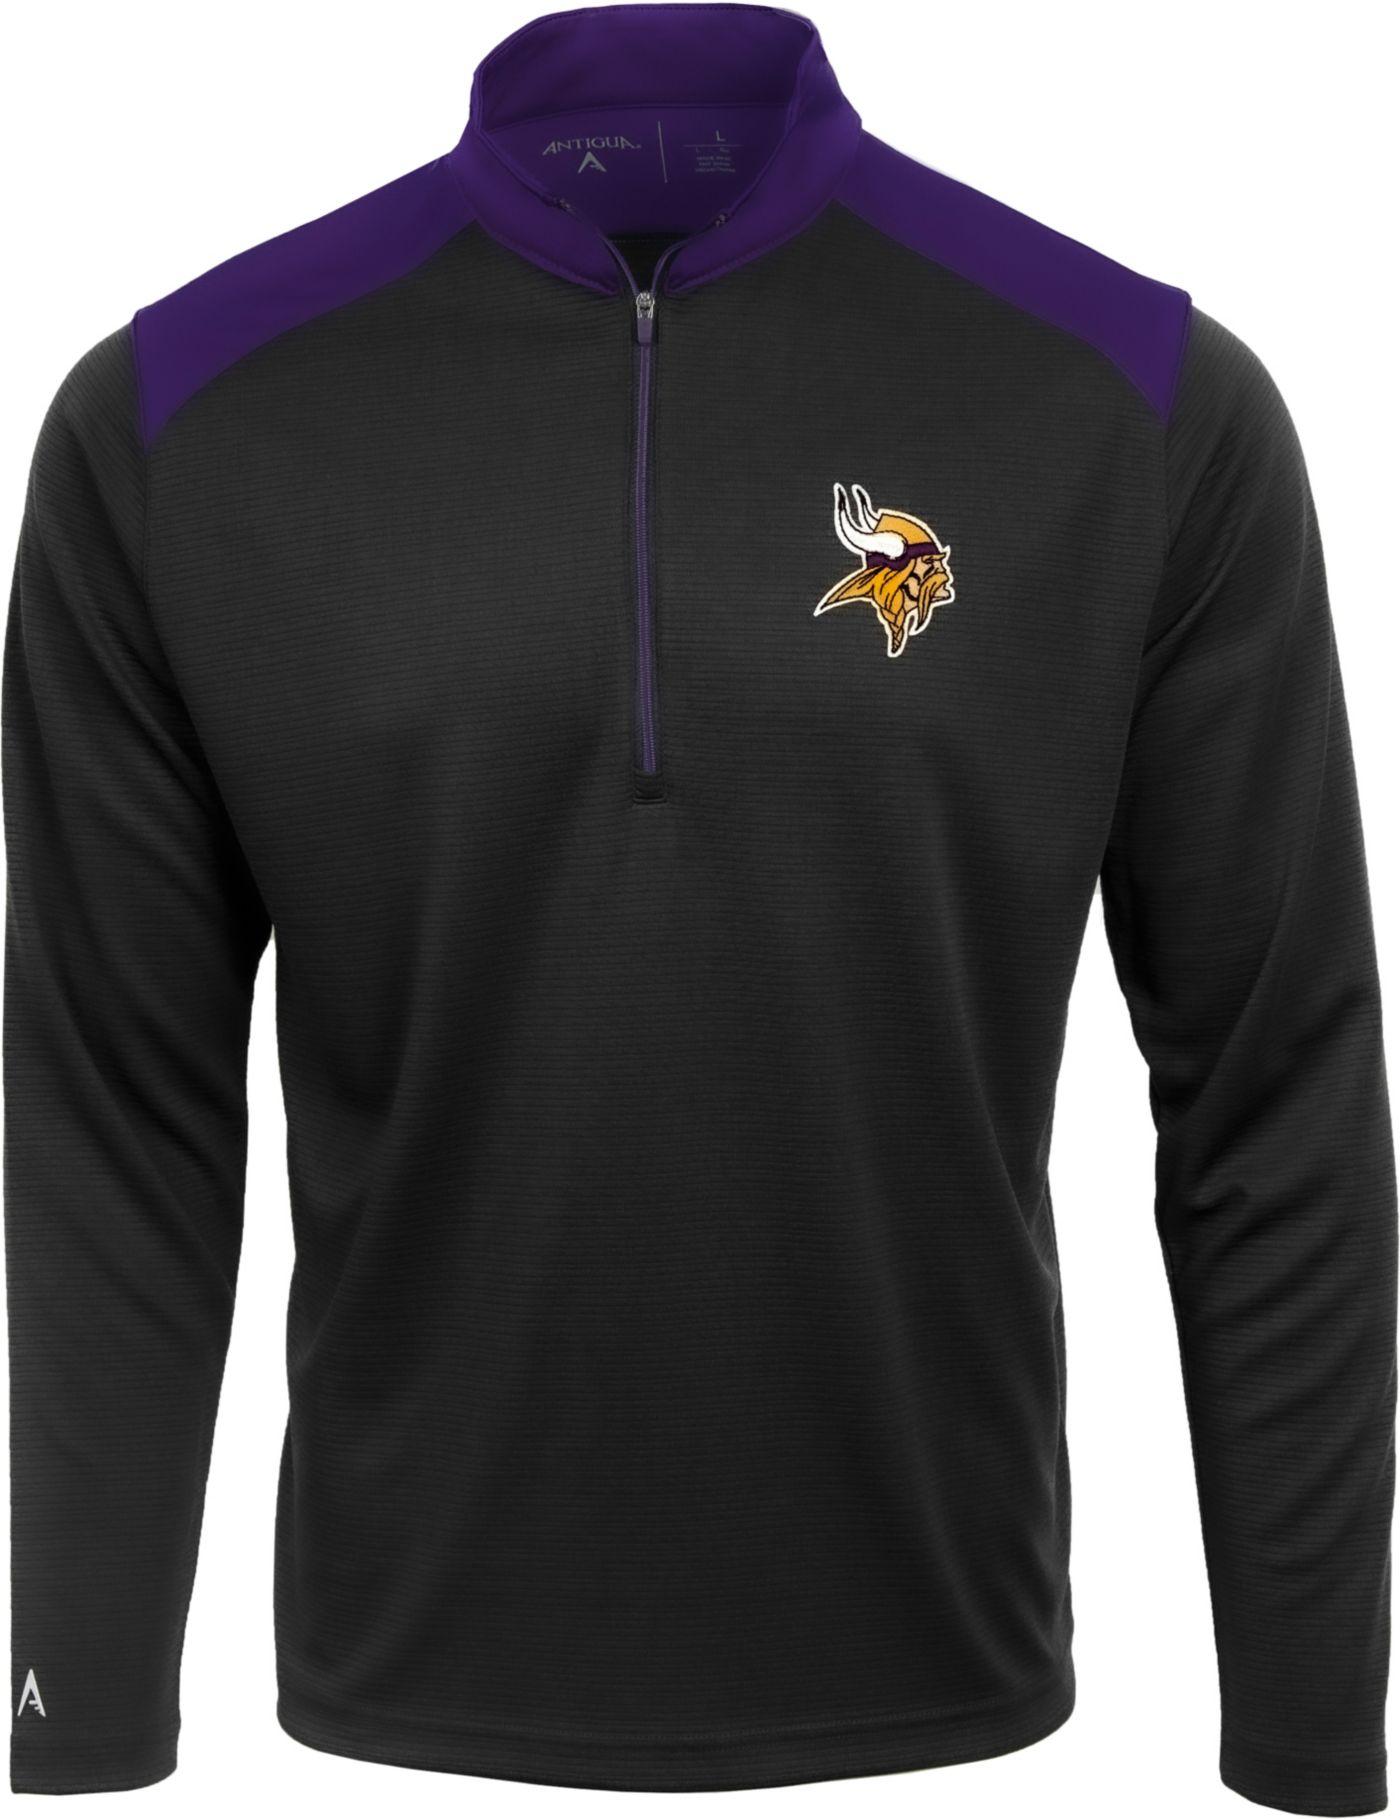 Antigua Men's Minnesota Vikings Velocity Black Quarter-Zip Pullover